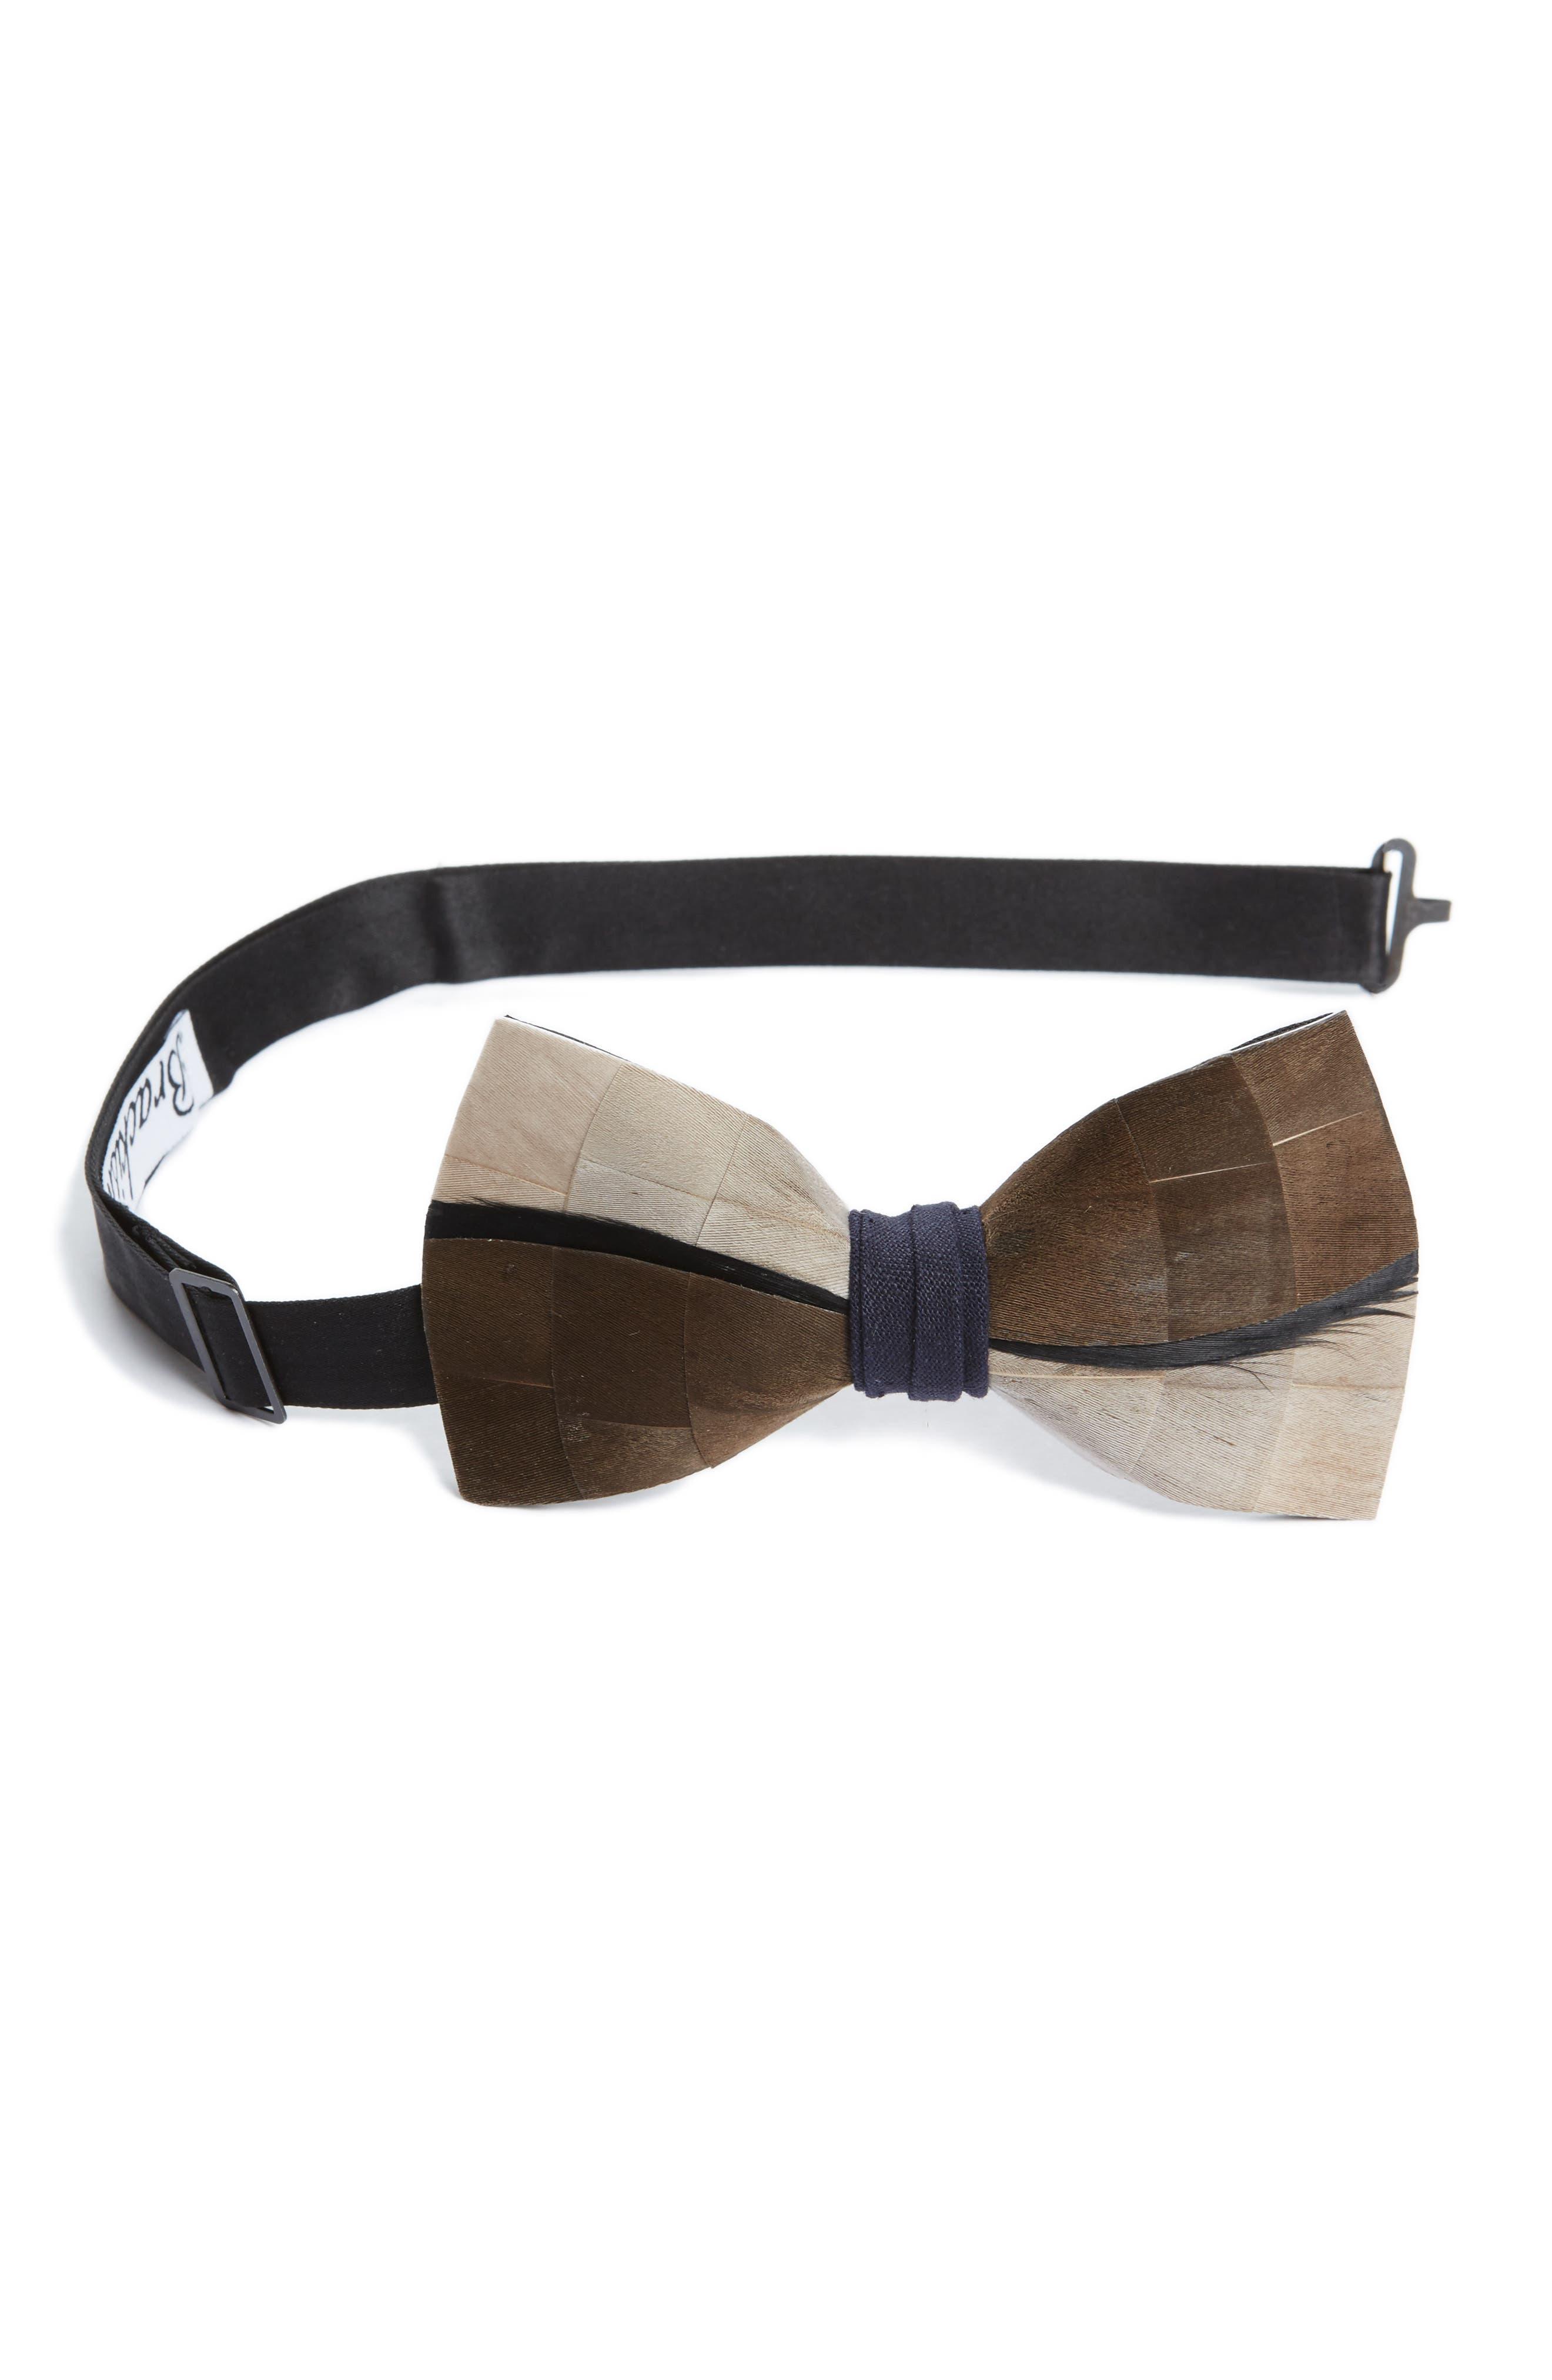 Main Image - Brackish & Bell Kiawah Feather Bow Tie